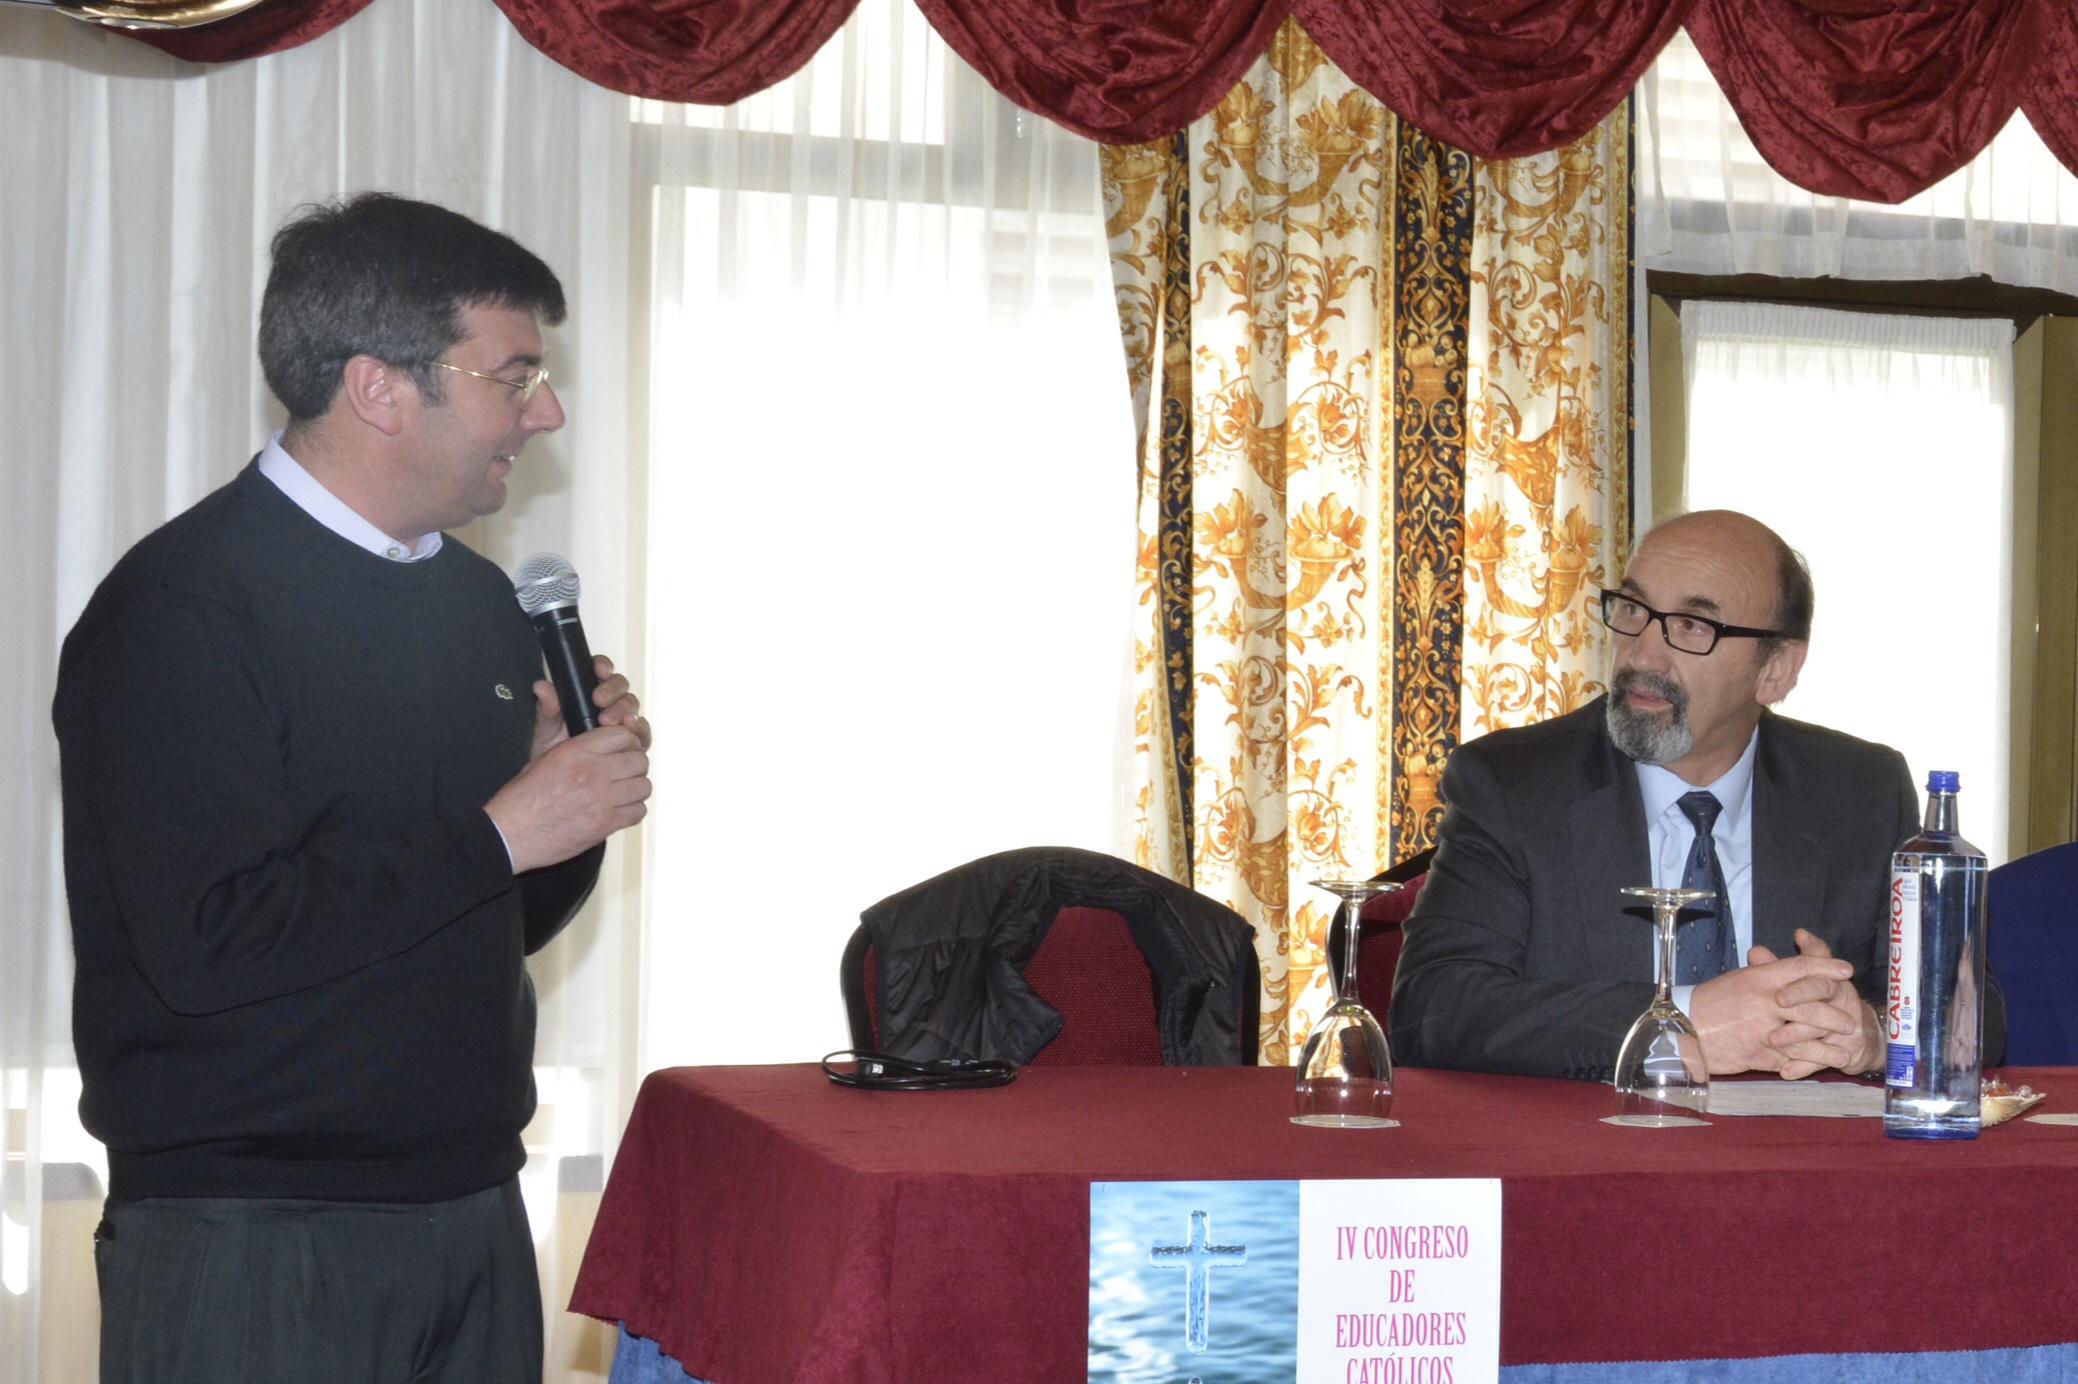 José Pérez e Luis Fernández Eiré